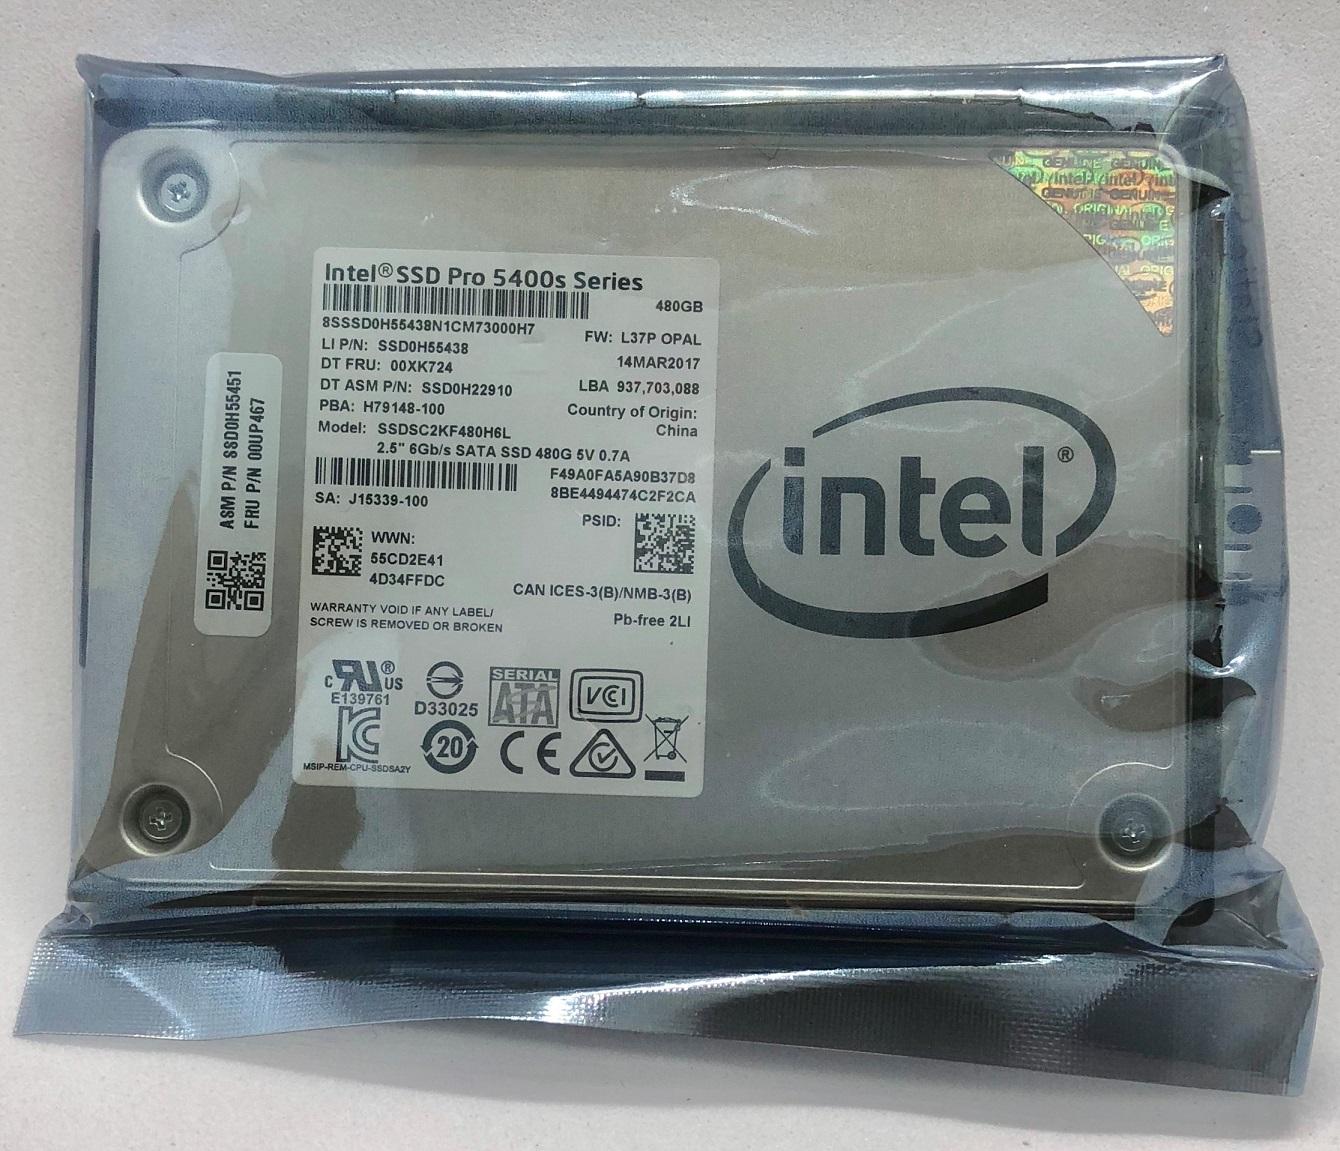 SSD:新品 Lenovo純正 2.5inch 7mm 480GB(Fru.No.:00UP467, SSDSC2KF480H6L)国内発送